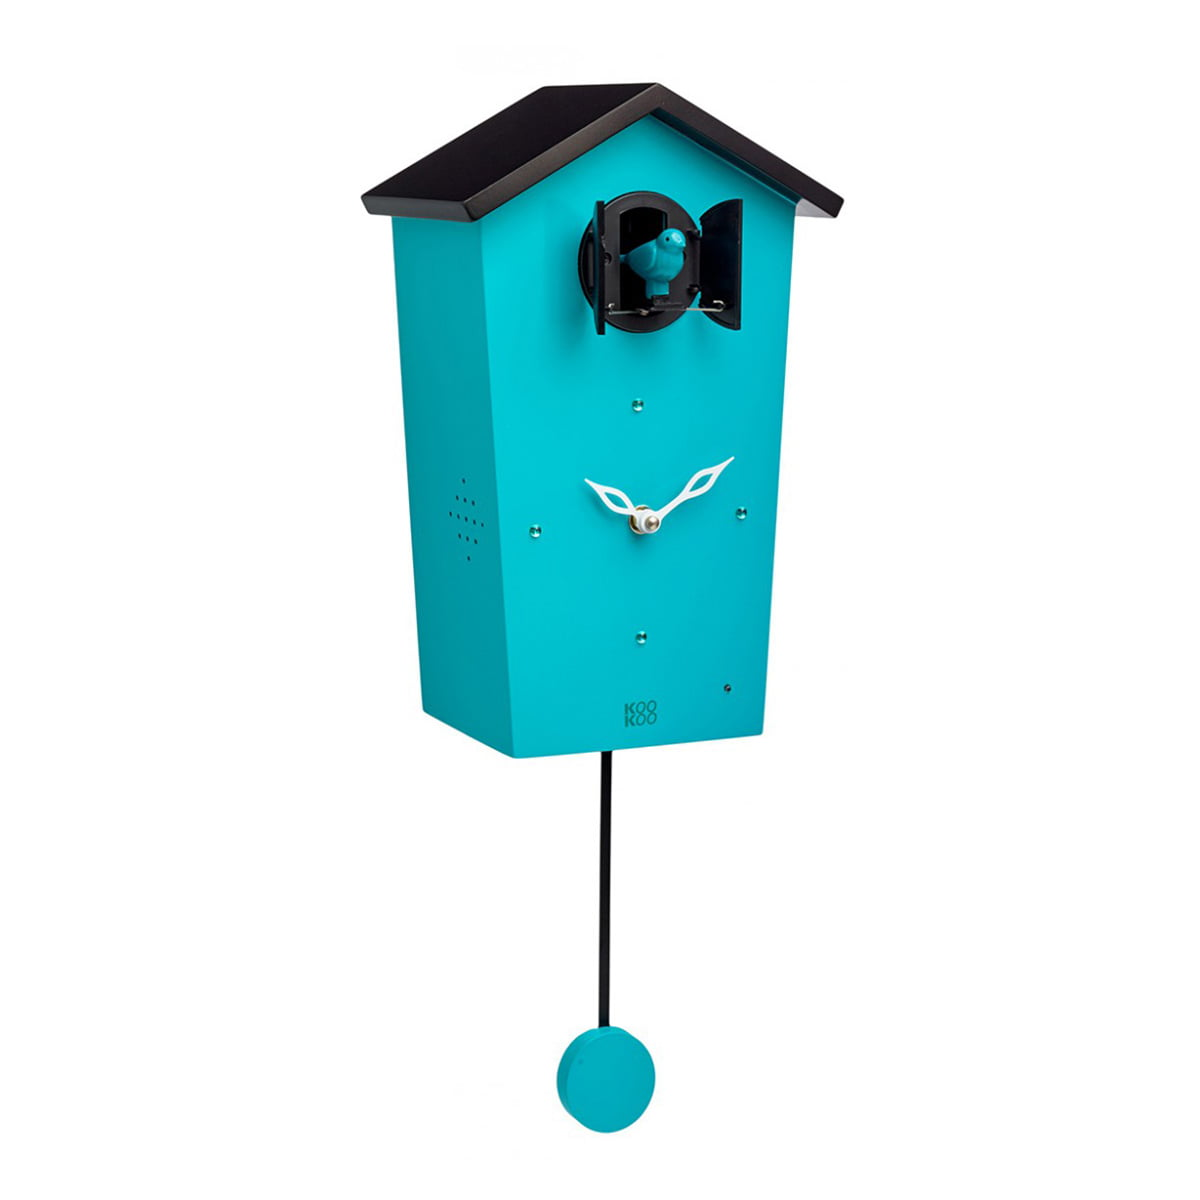 KooKoo - Bird House Kuckucksuhr, petrol (Limited Edition) | Dekoration > Uhren > Kuckucksuhren | Petrolblau | Mdf holz | KooKoo